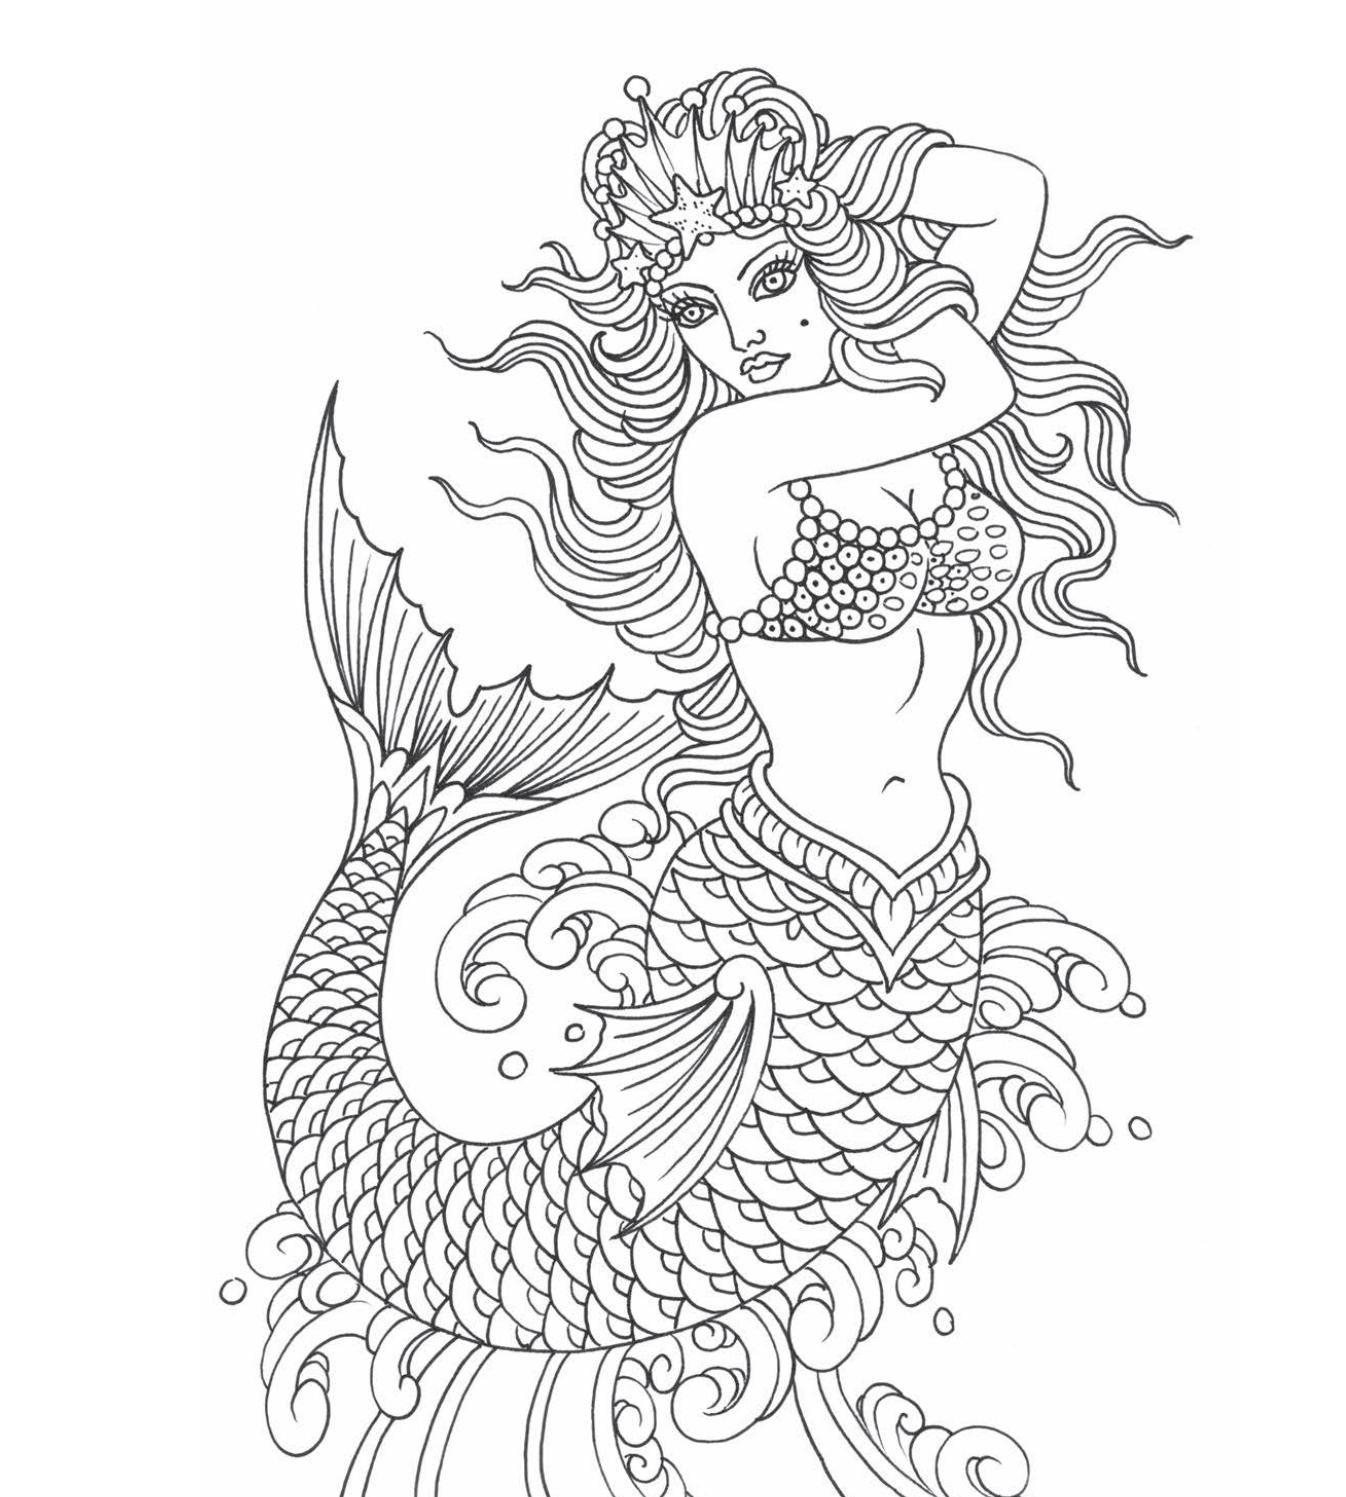 Flash Chris garver, Black, grey tattoos, Dragon sleeve